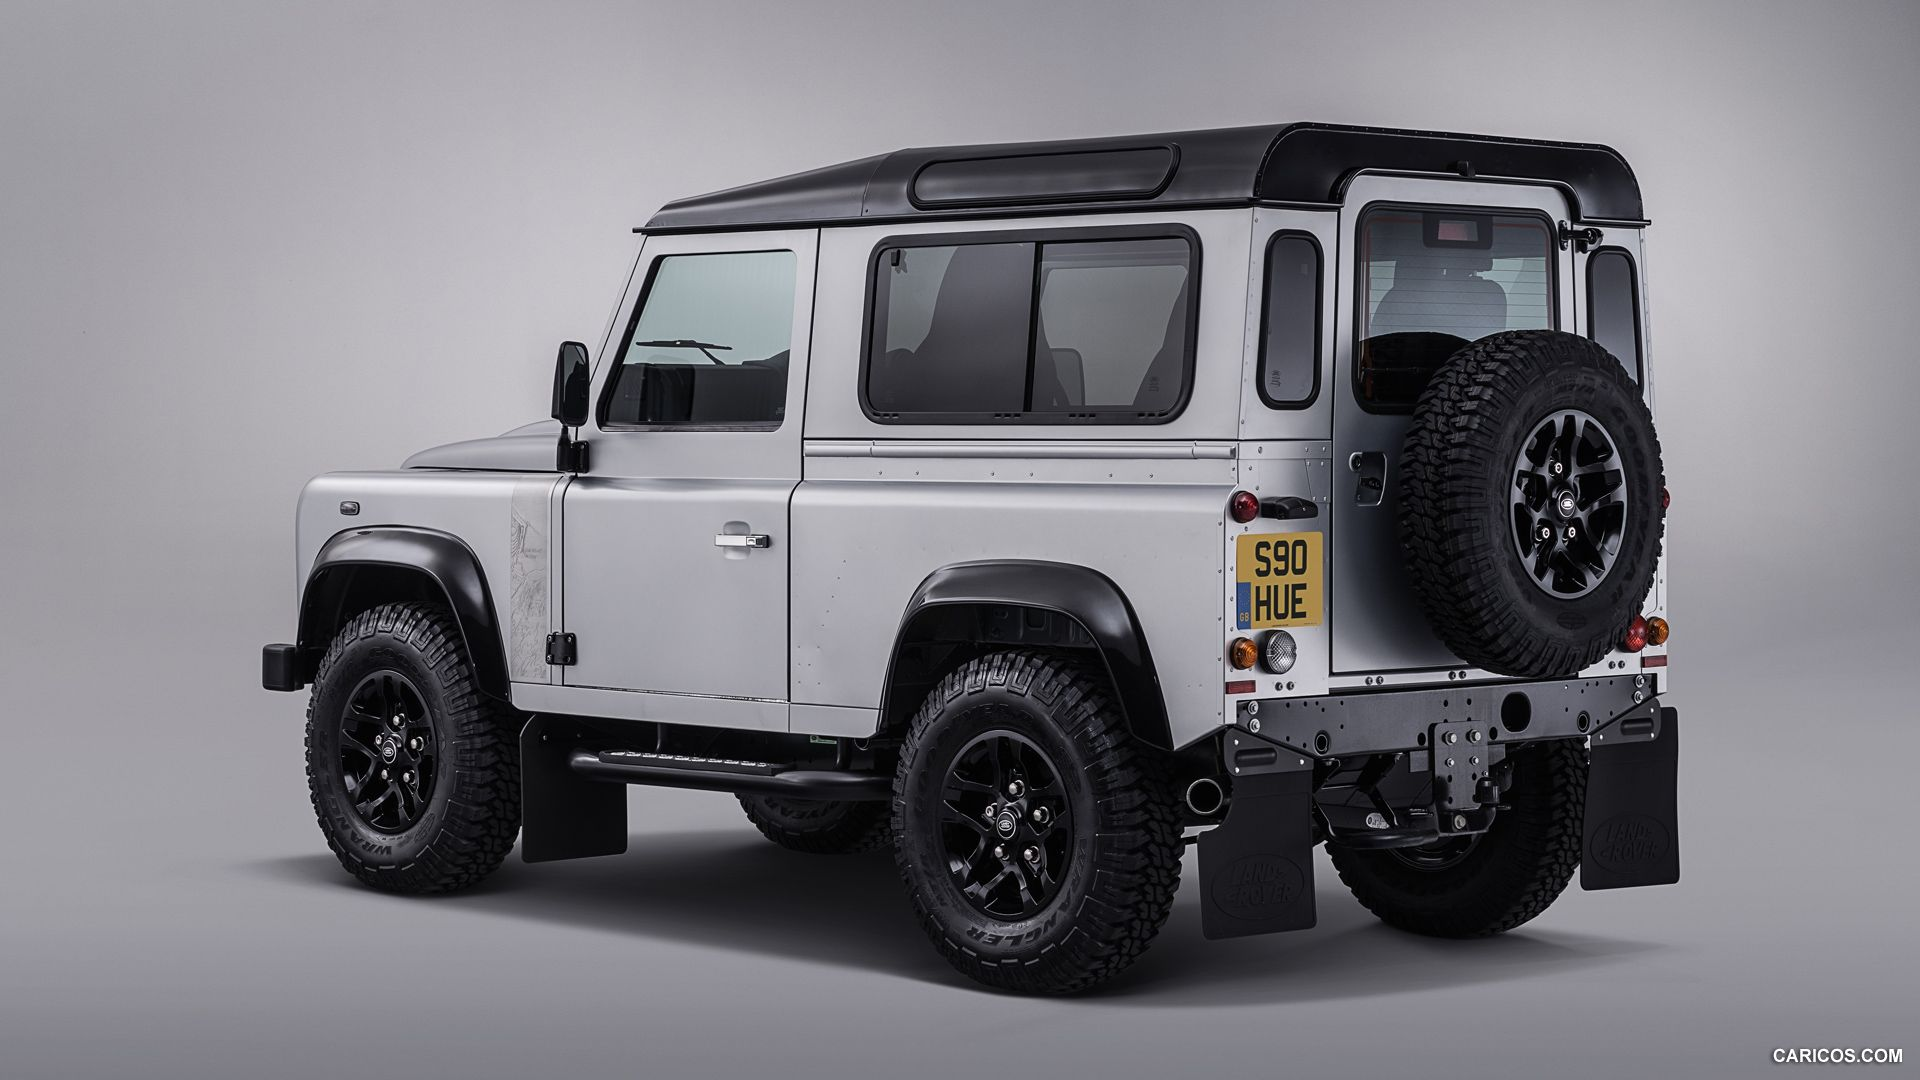 2015 Land Rover Defender No. 2,000,000 Wallpaper 랜드로버